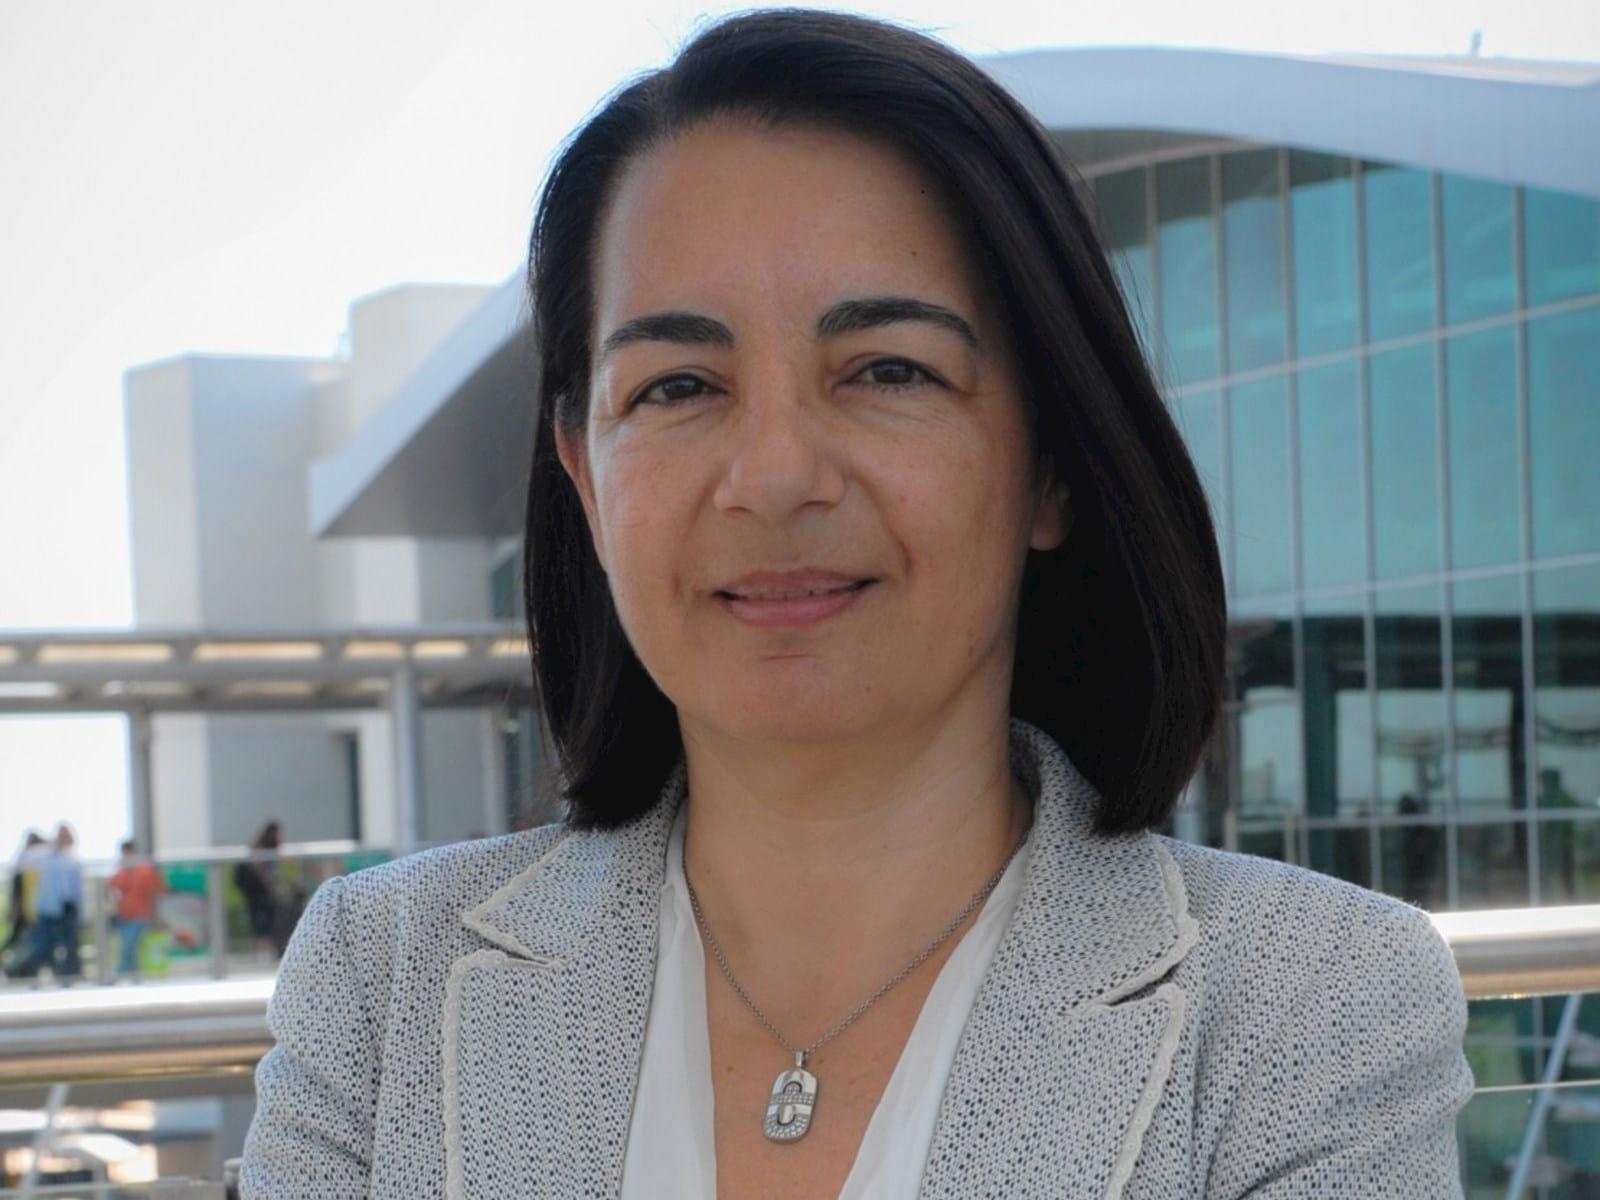 Eleni Kaloyirou, CEO of Hermes Airports